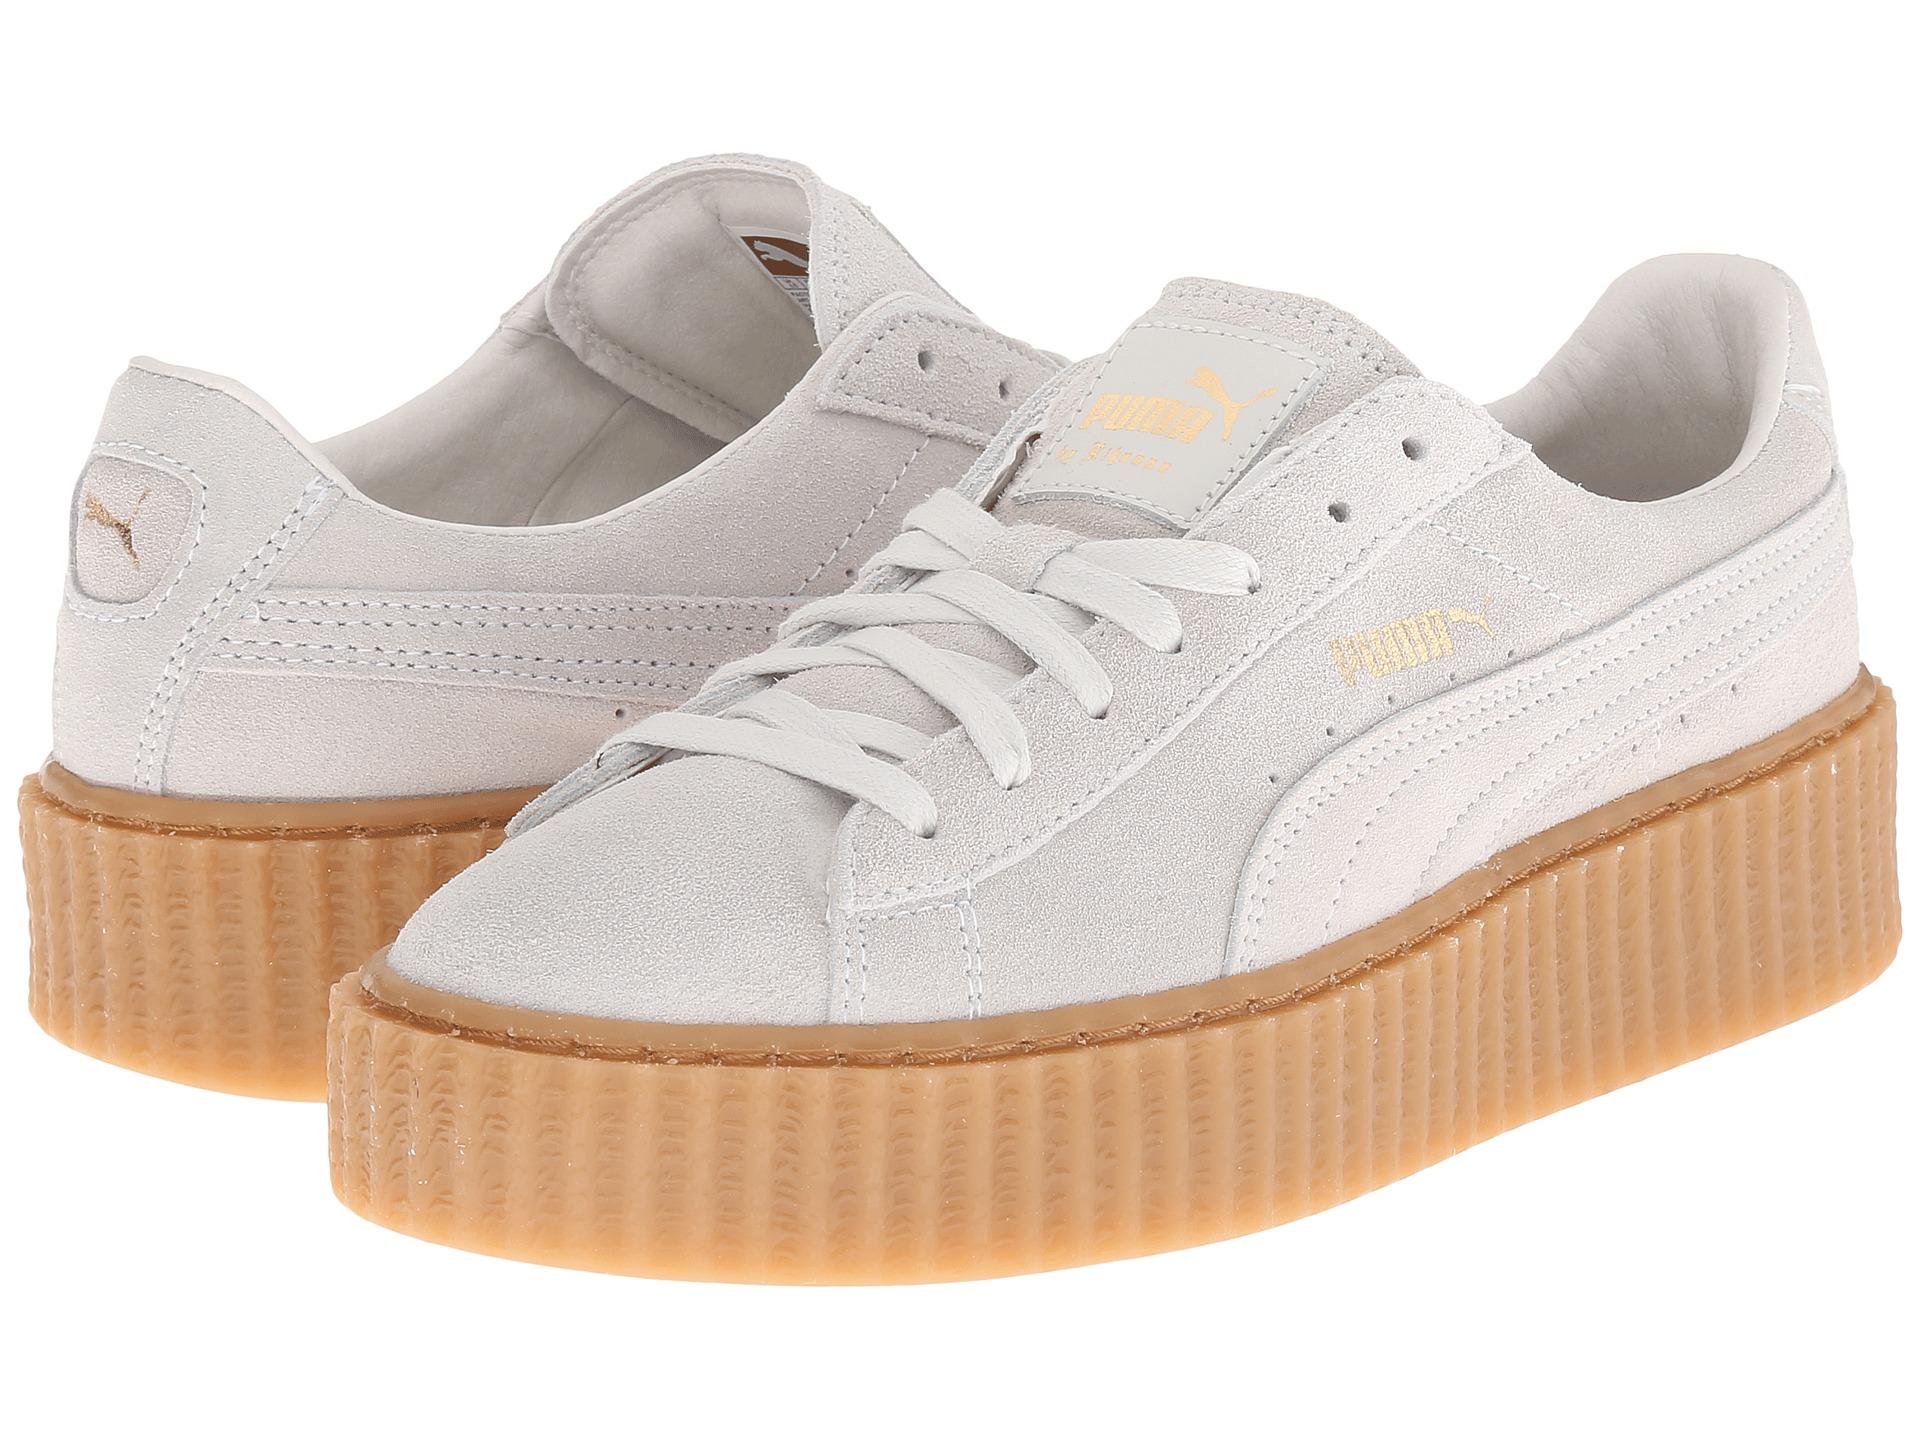 hot sale online e639e 24b6f cheap puma x rihanna fenty creeper sneakers 1603b 5c625